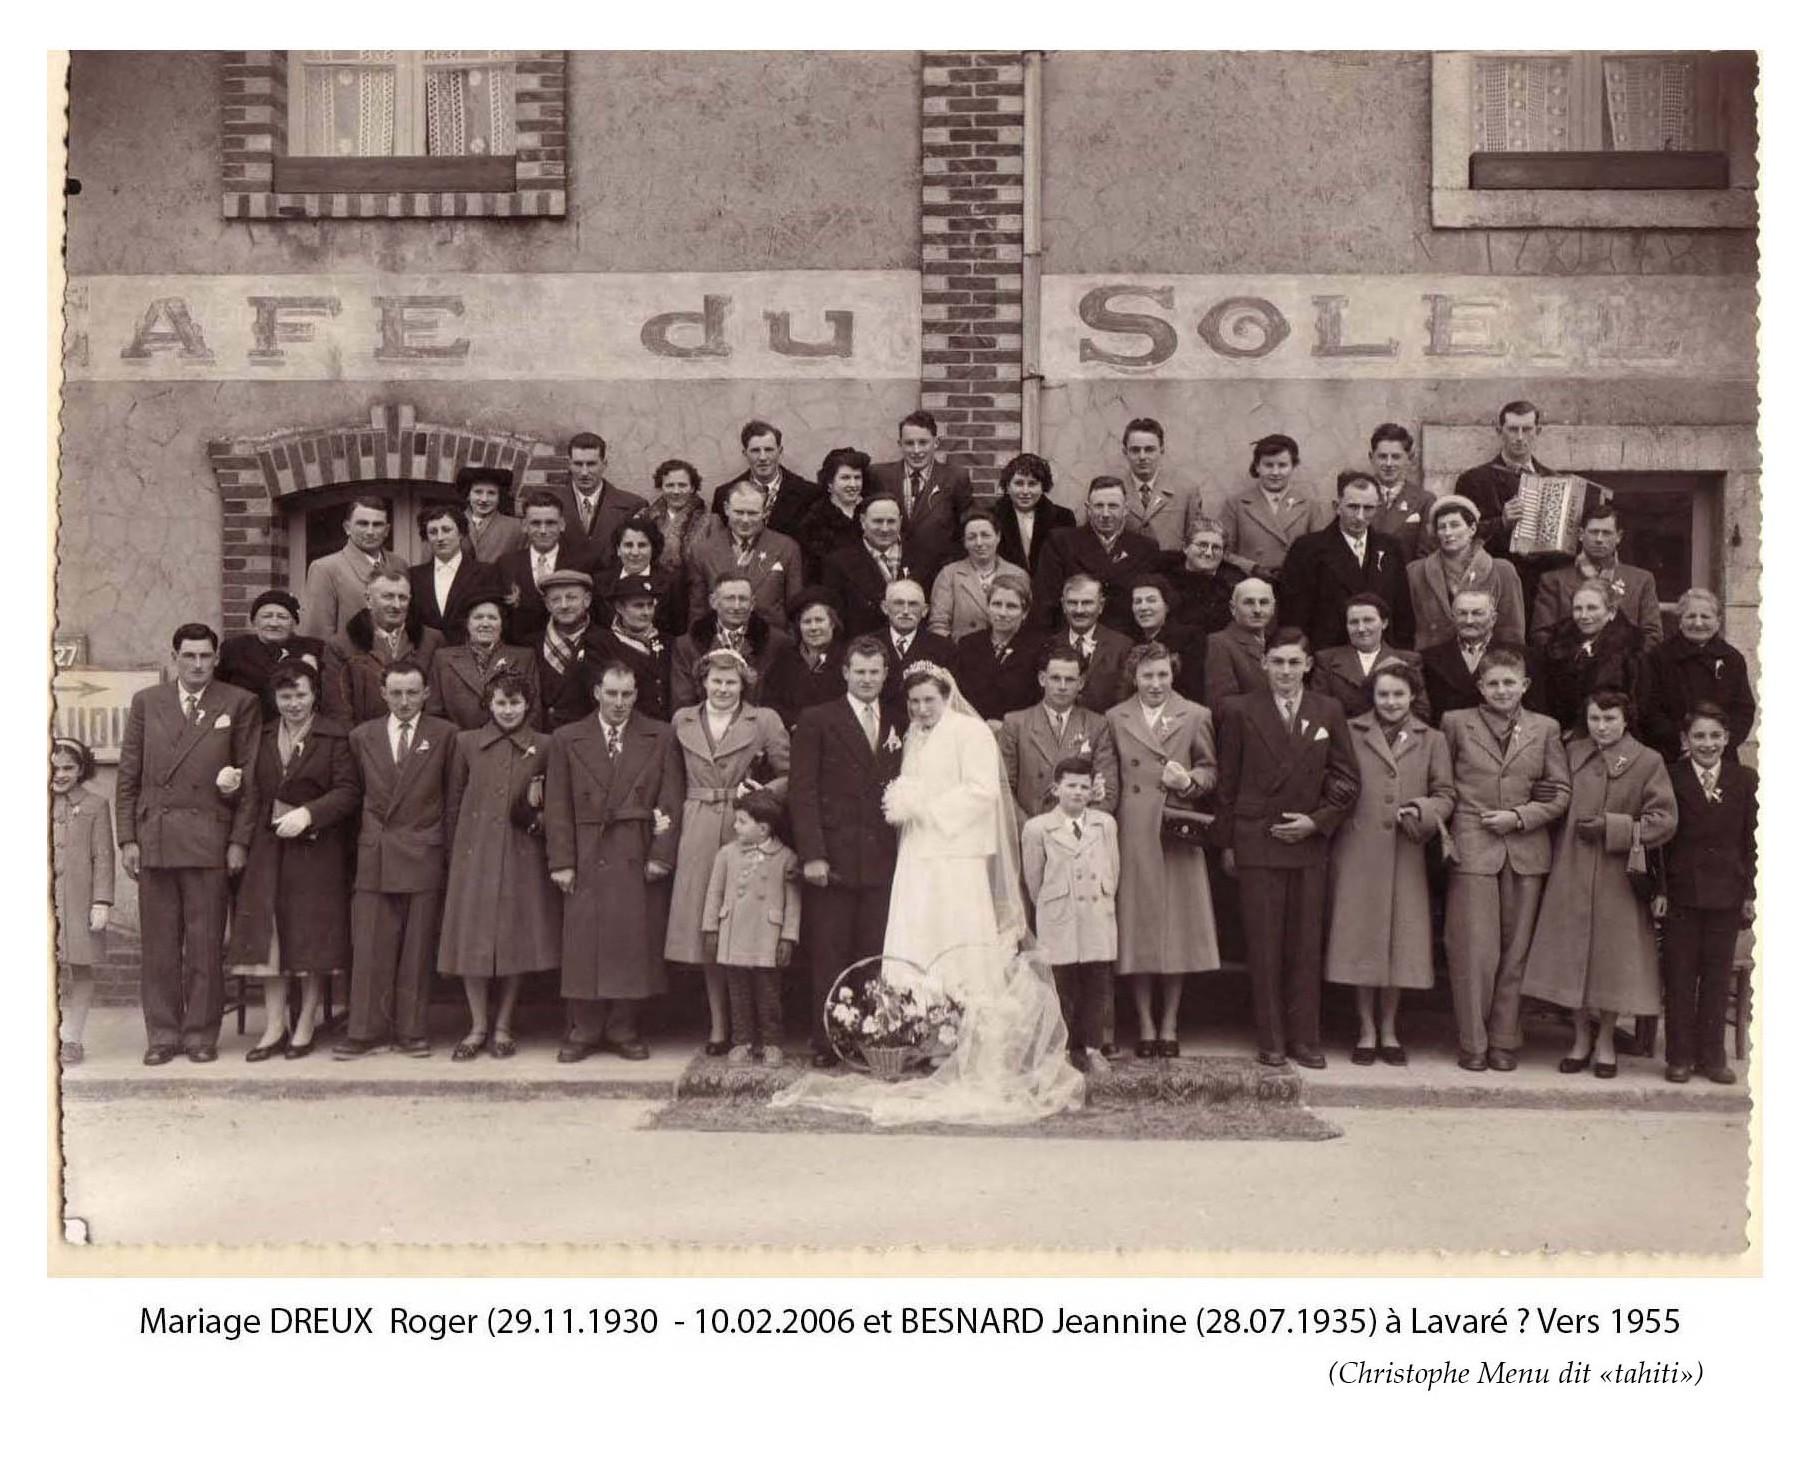 Lavaré - Mariage - DREUX Roger et BESNARD Jeannine - Vers 1955 (Christophe Menu dit Tahiti)